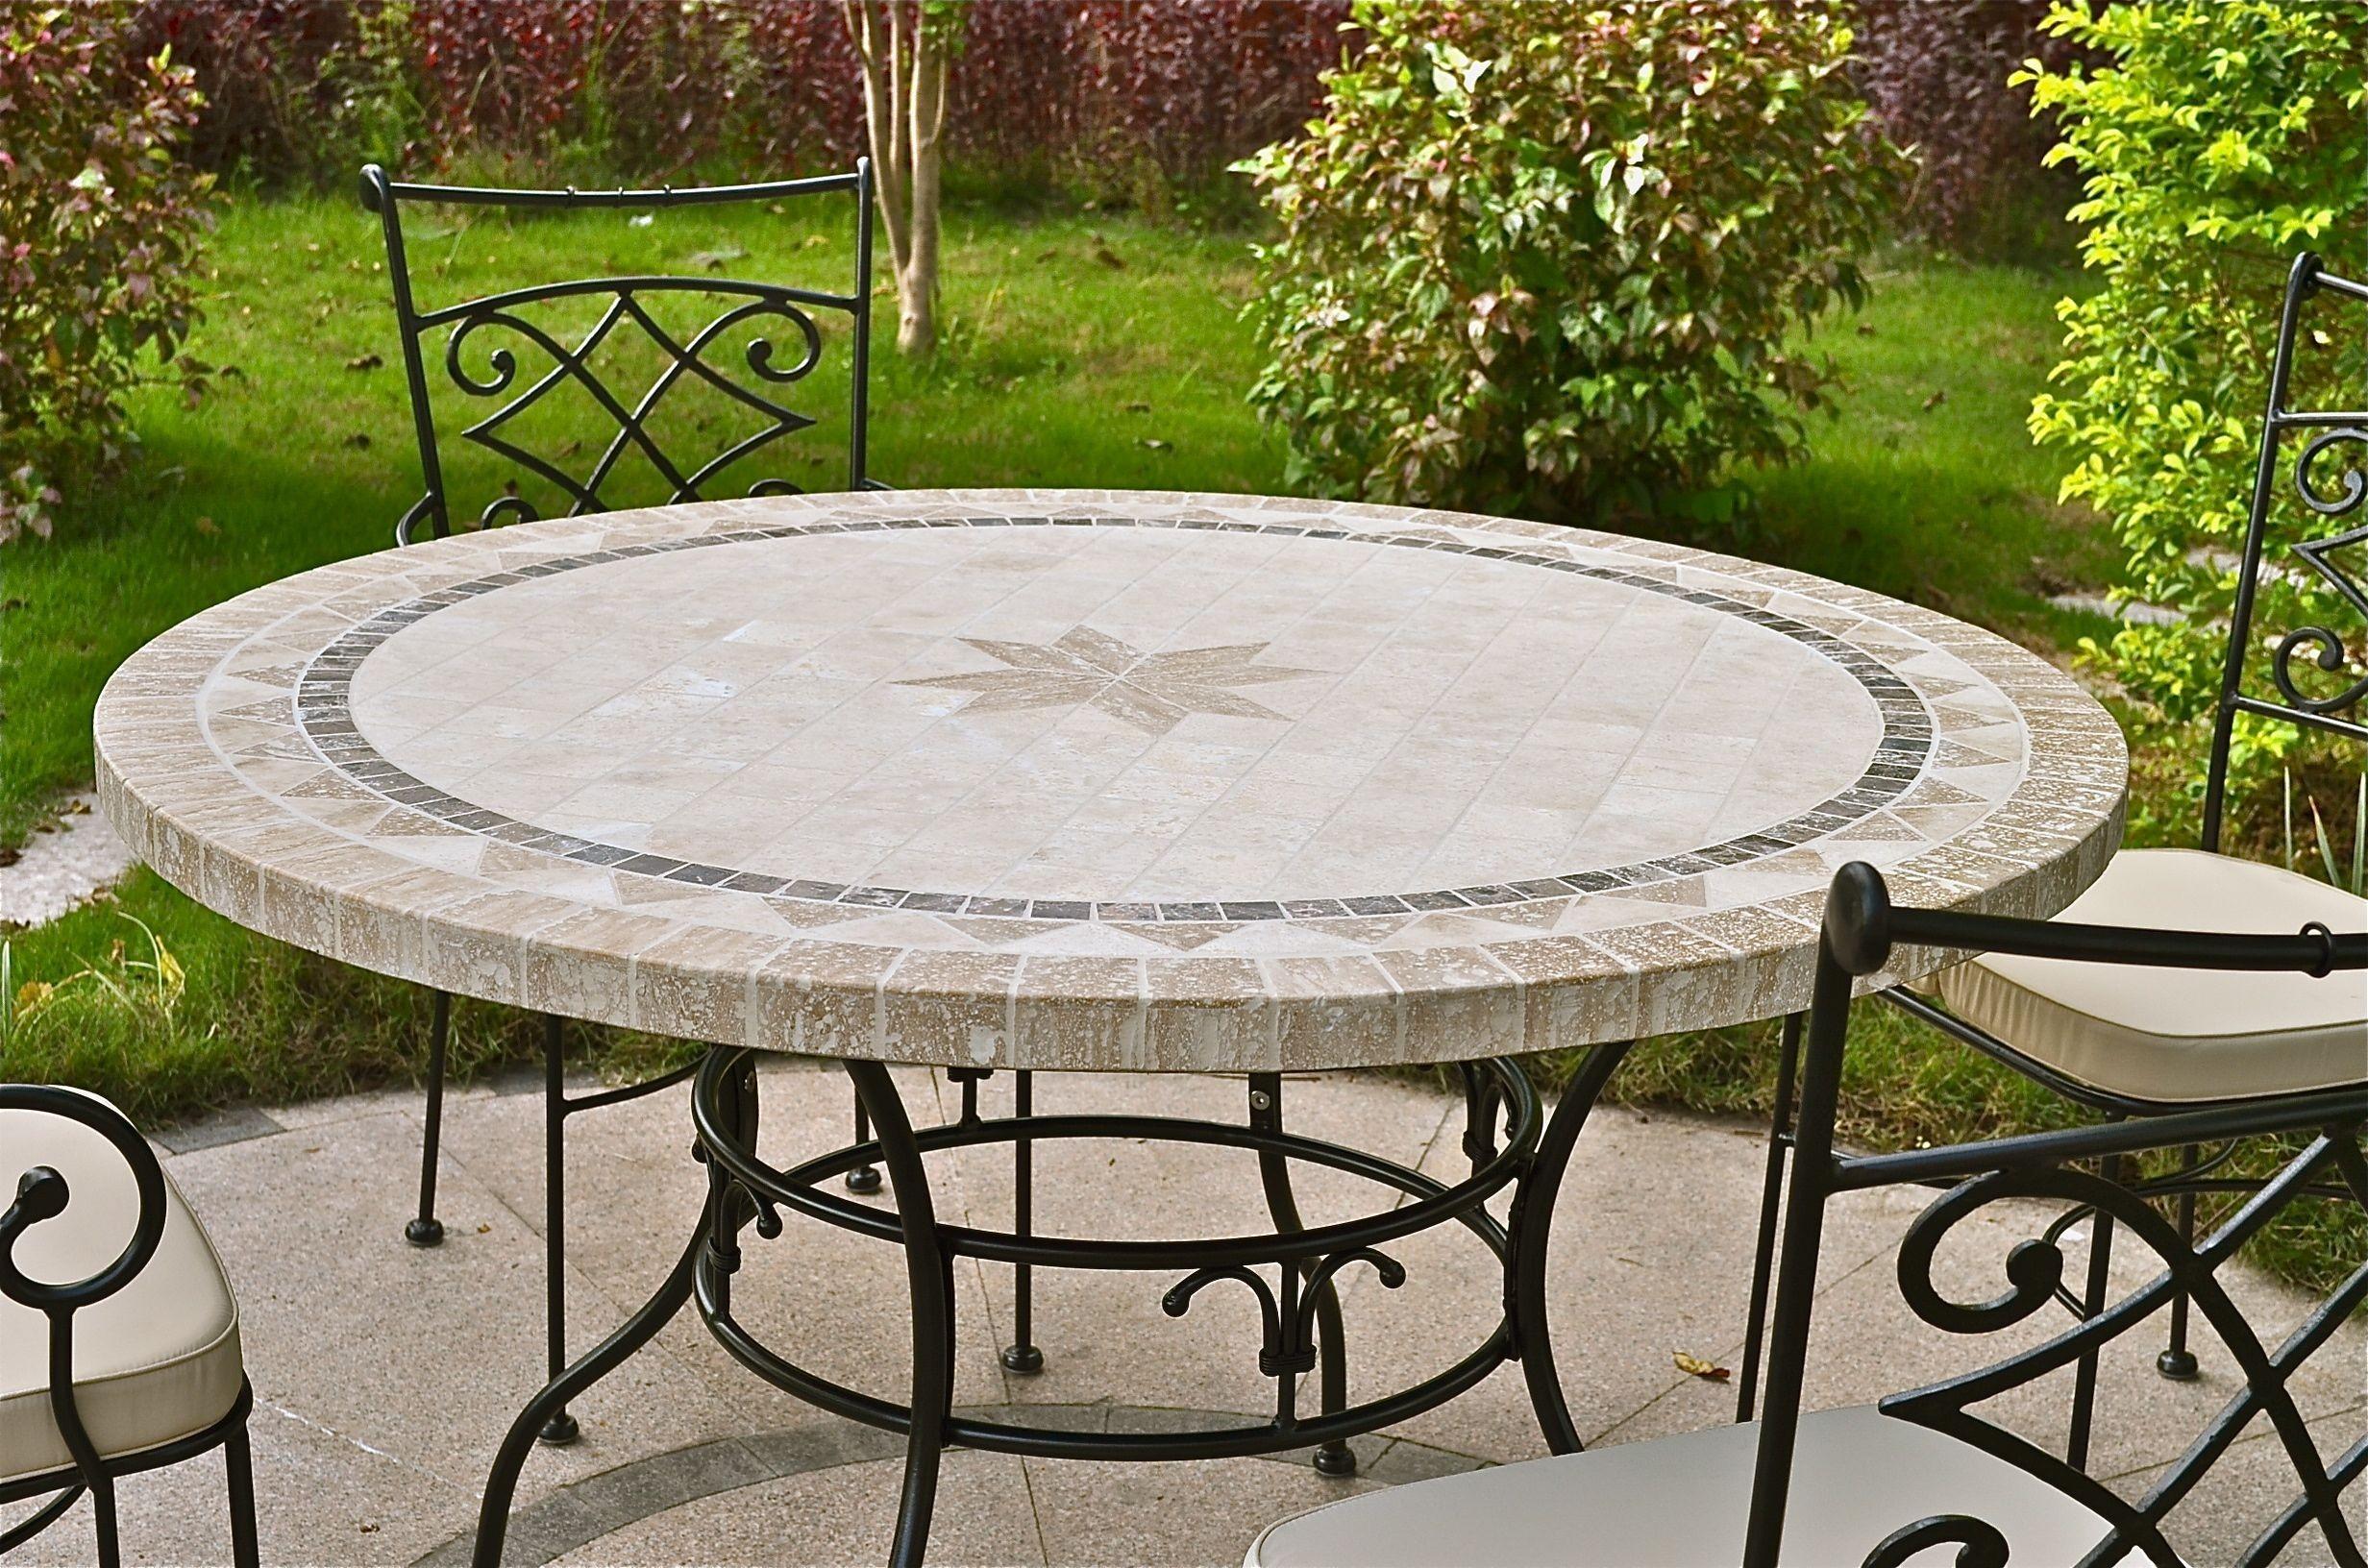 Table de jardin pierre ronde mosaïque marbre 125-160 MEXICO